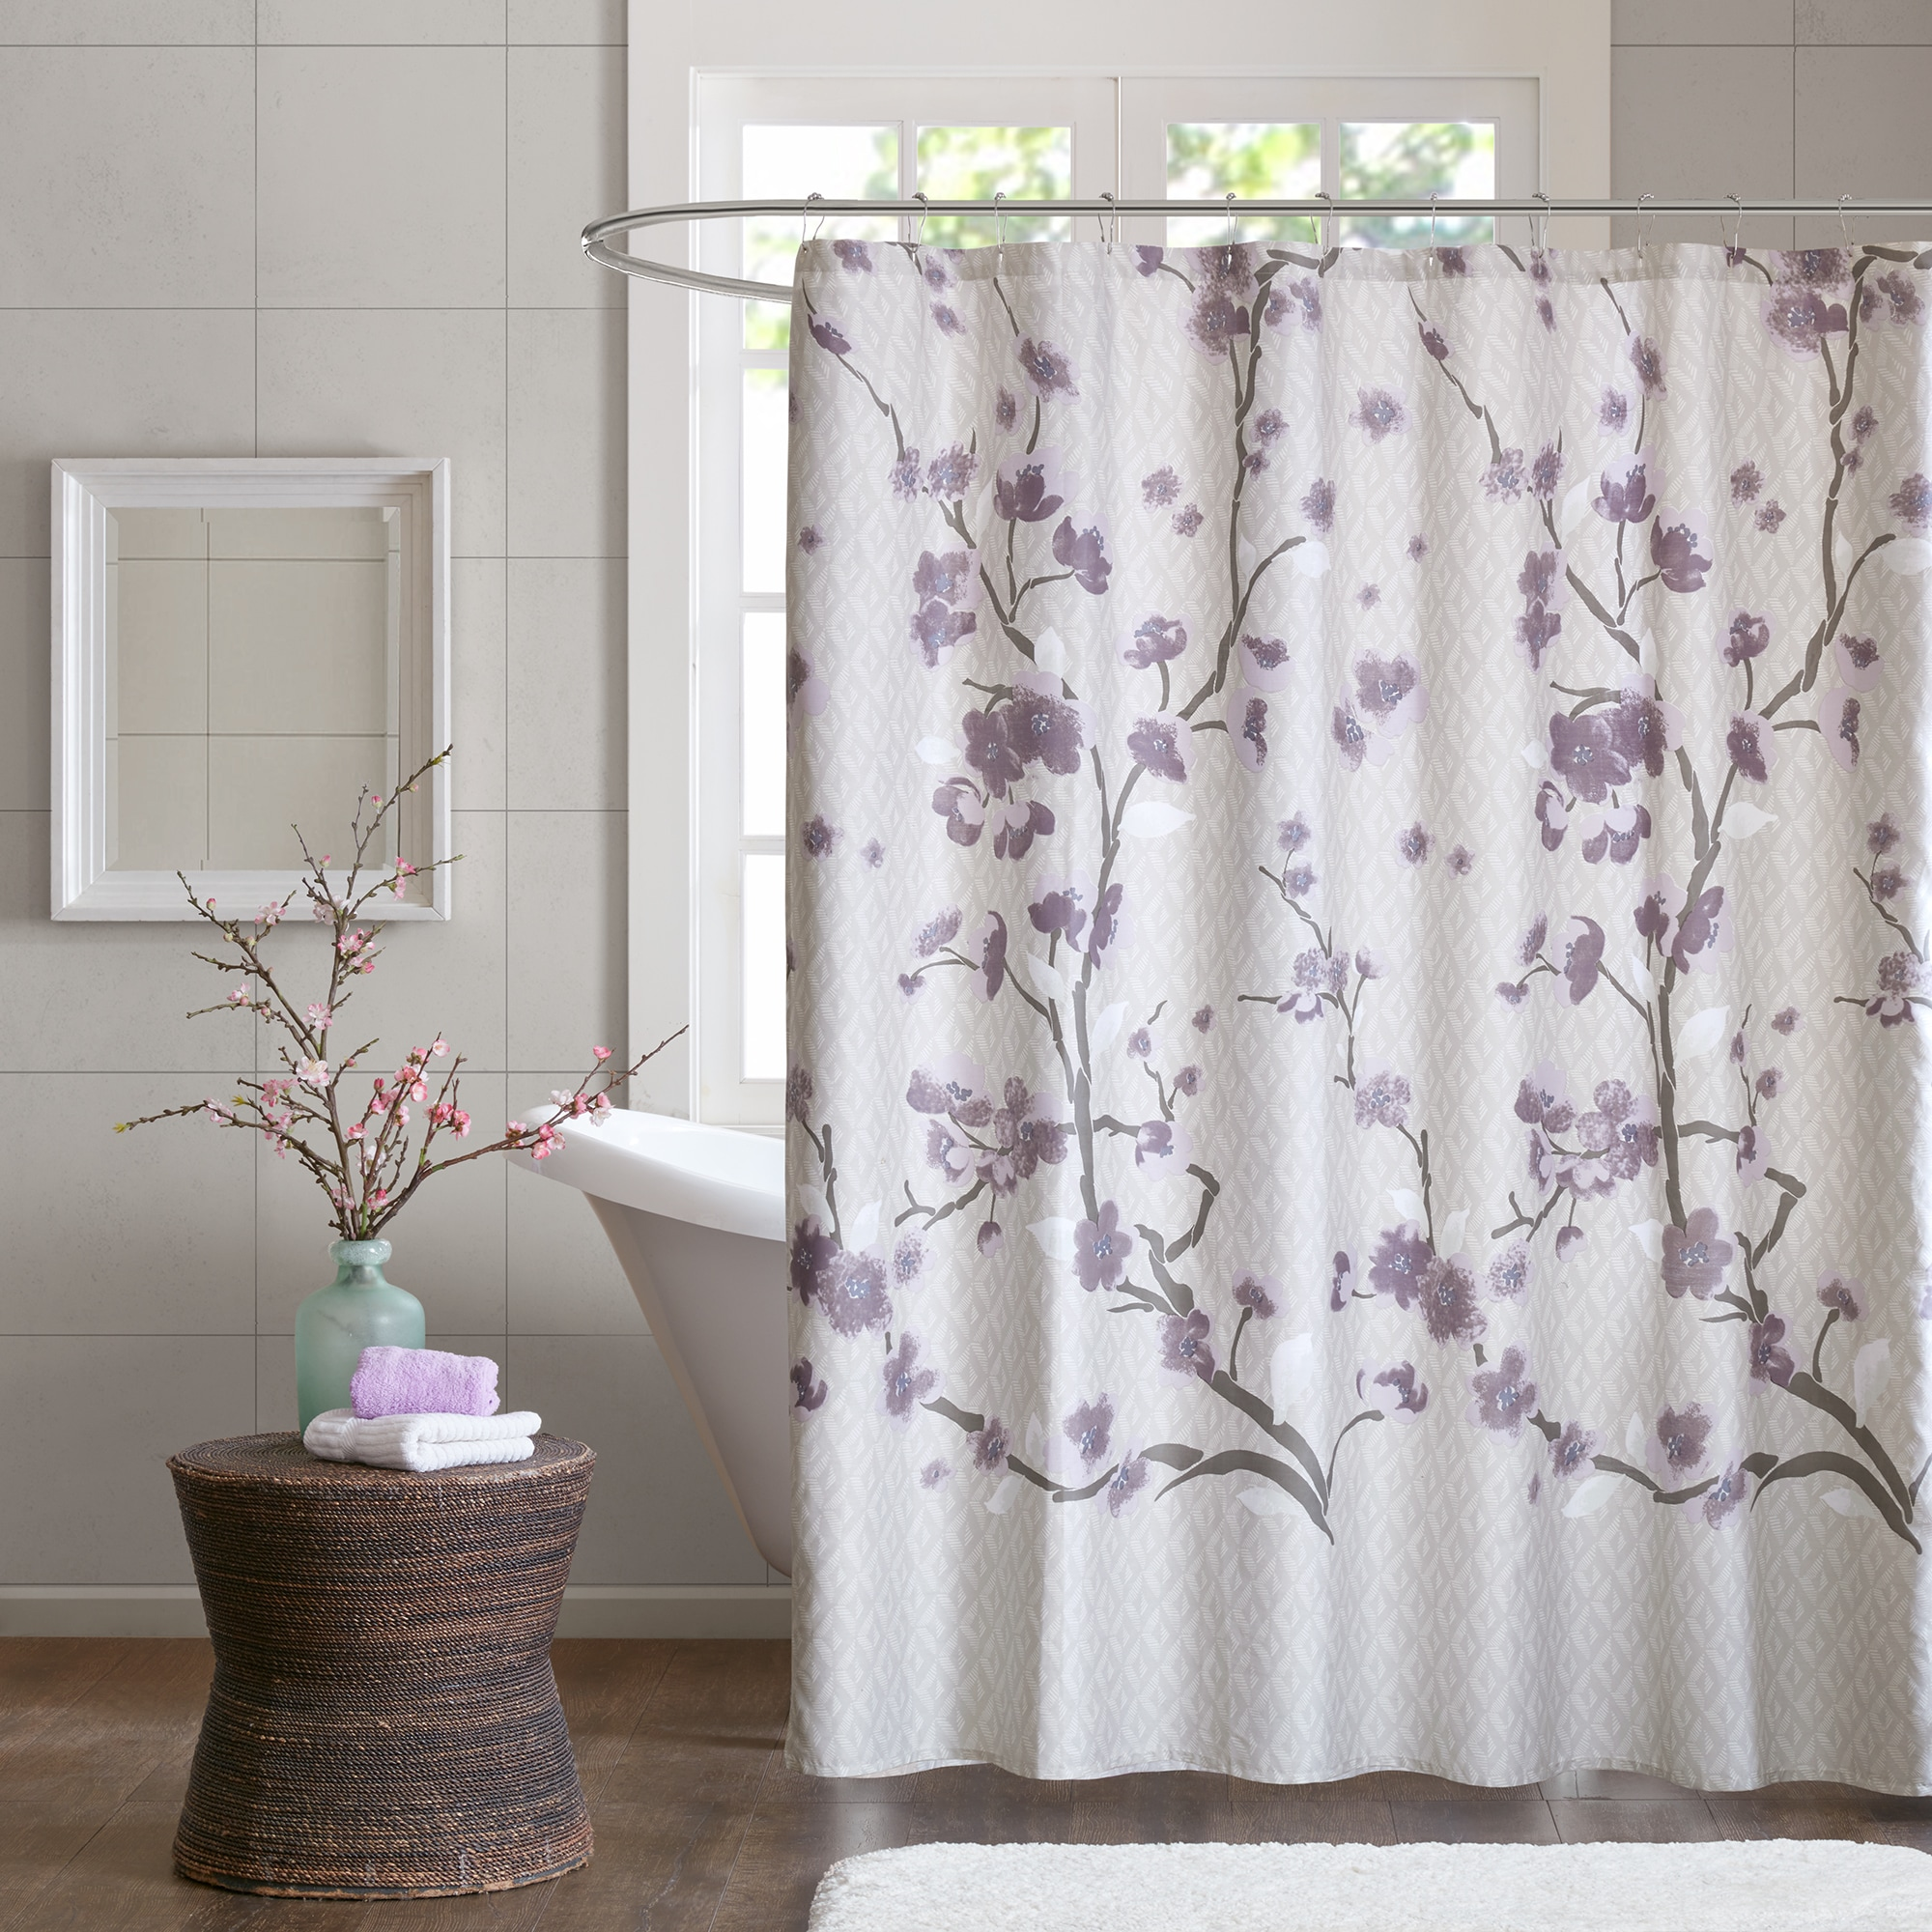 Shop Black Friday Deals On Copper Grove Cultus Cotton Printed Purple Shower Curtain On Sale Overstock 20830867 Purple